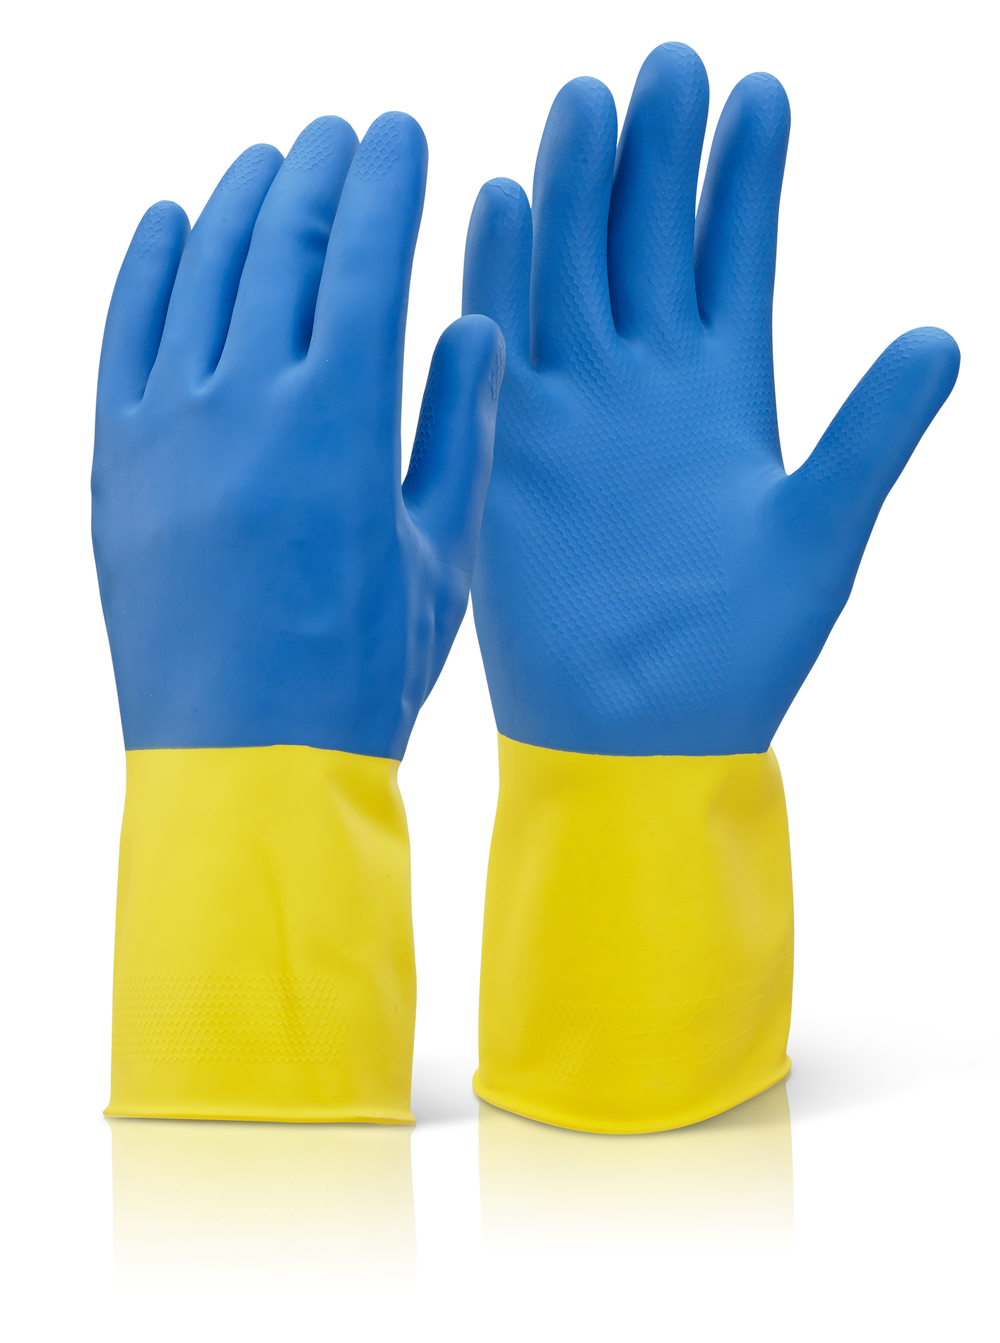 BCYB Gloves